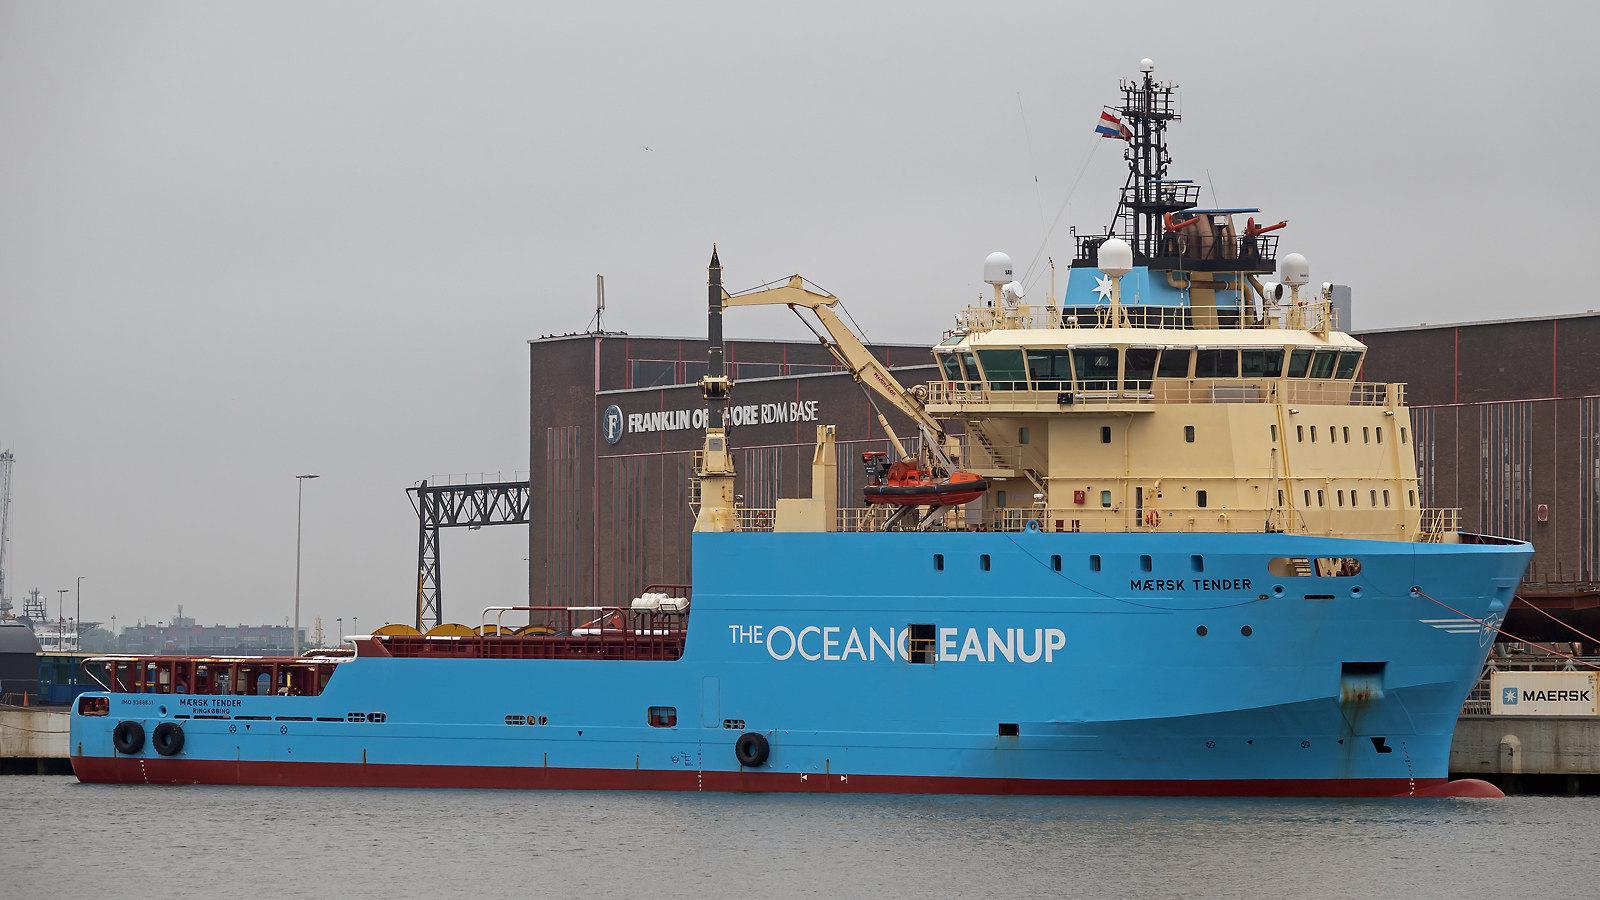 Maersk Tender